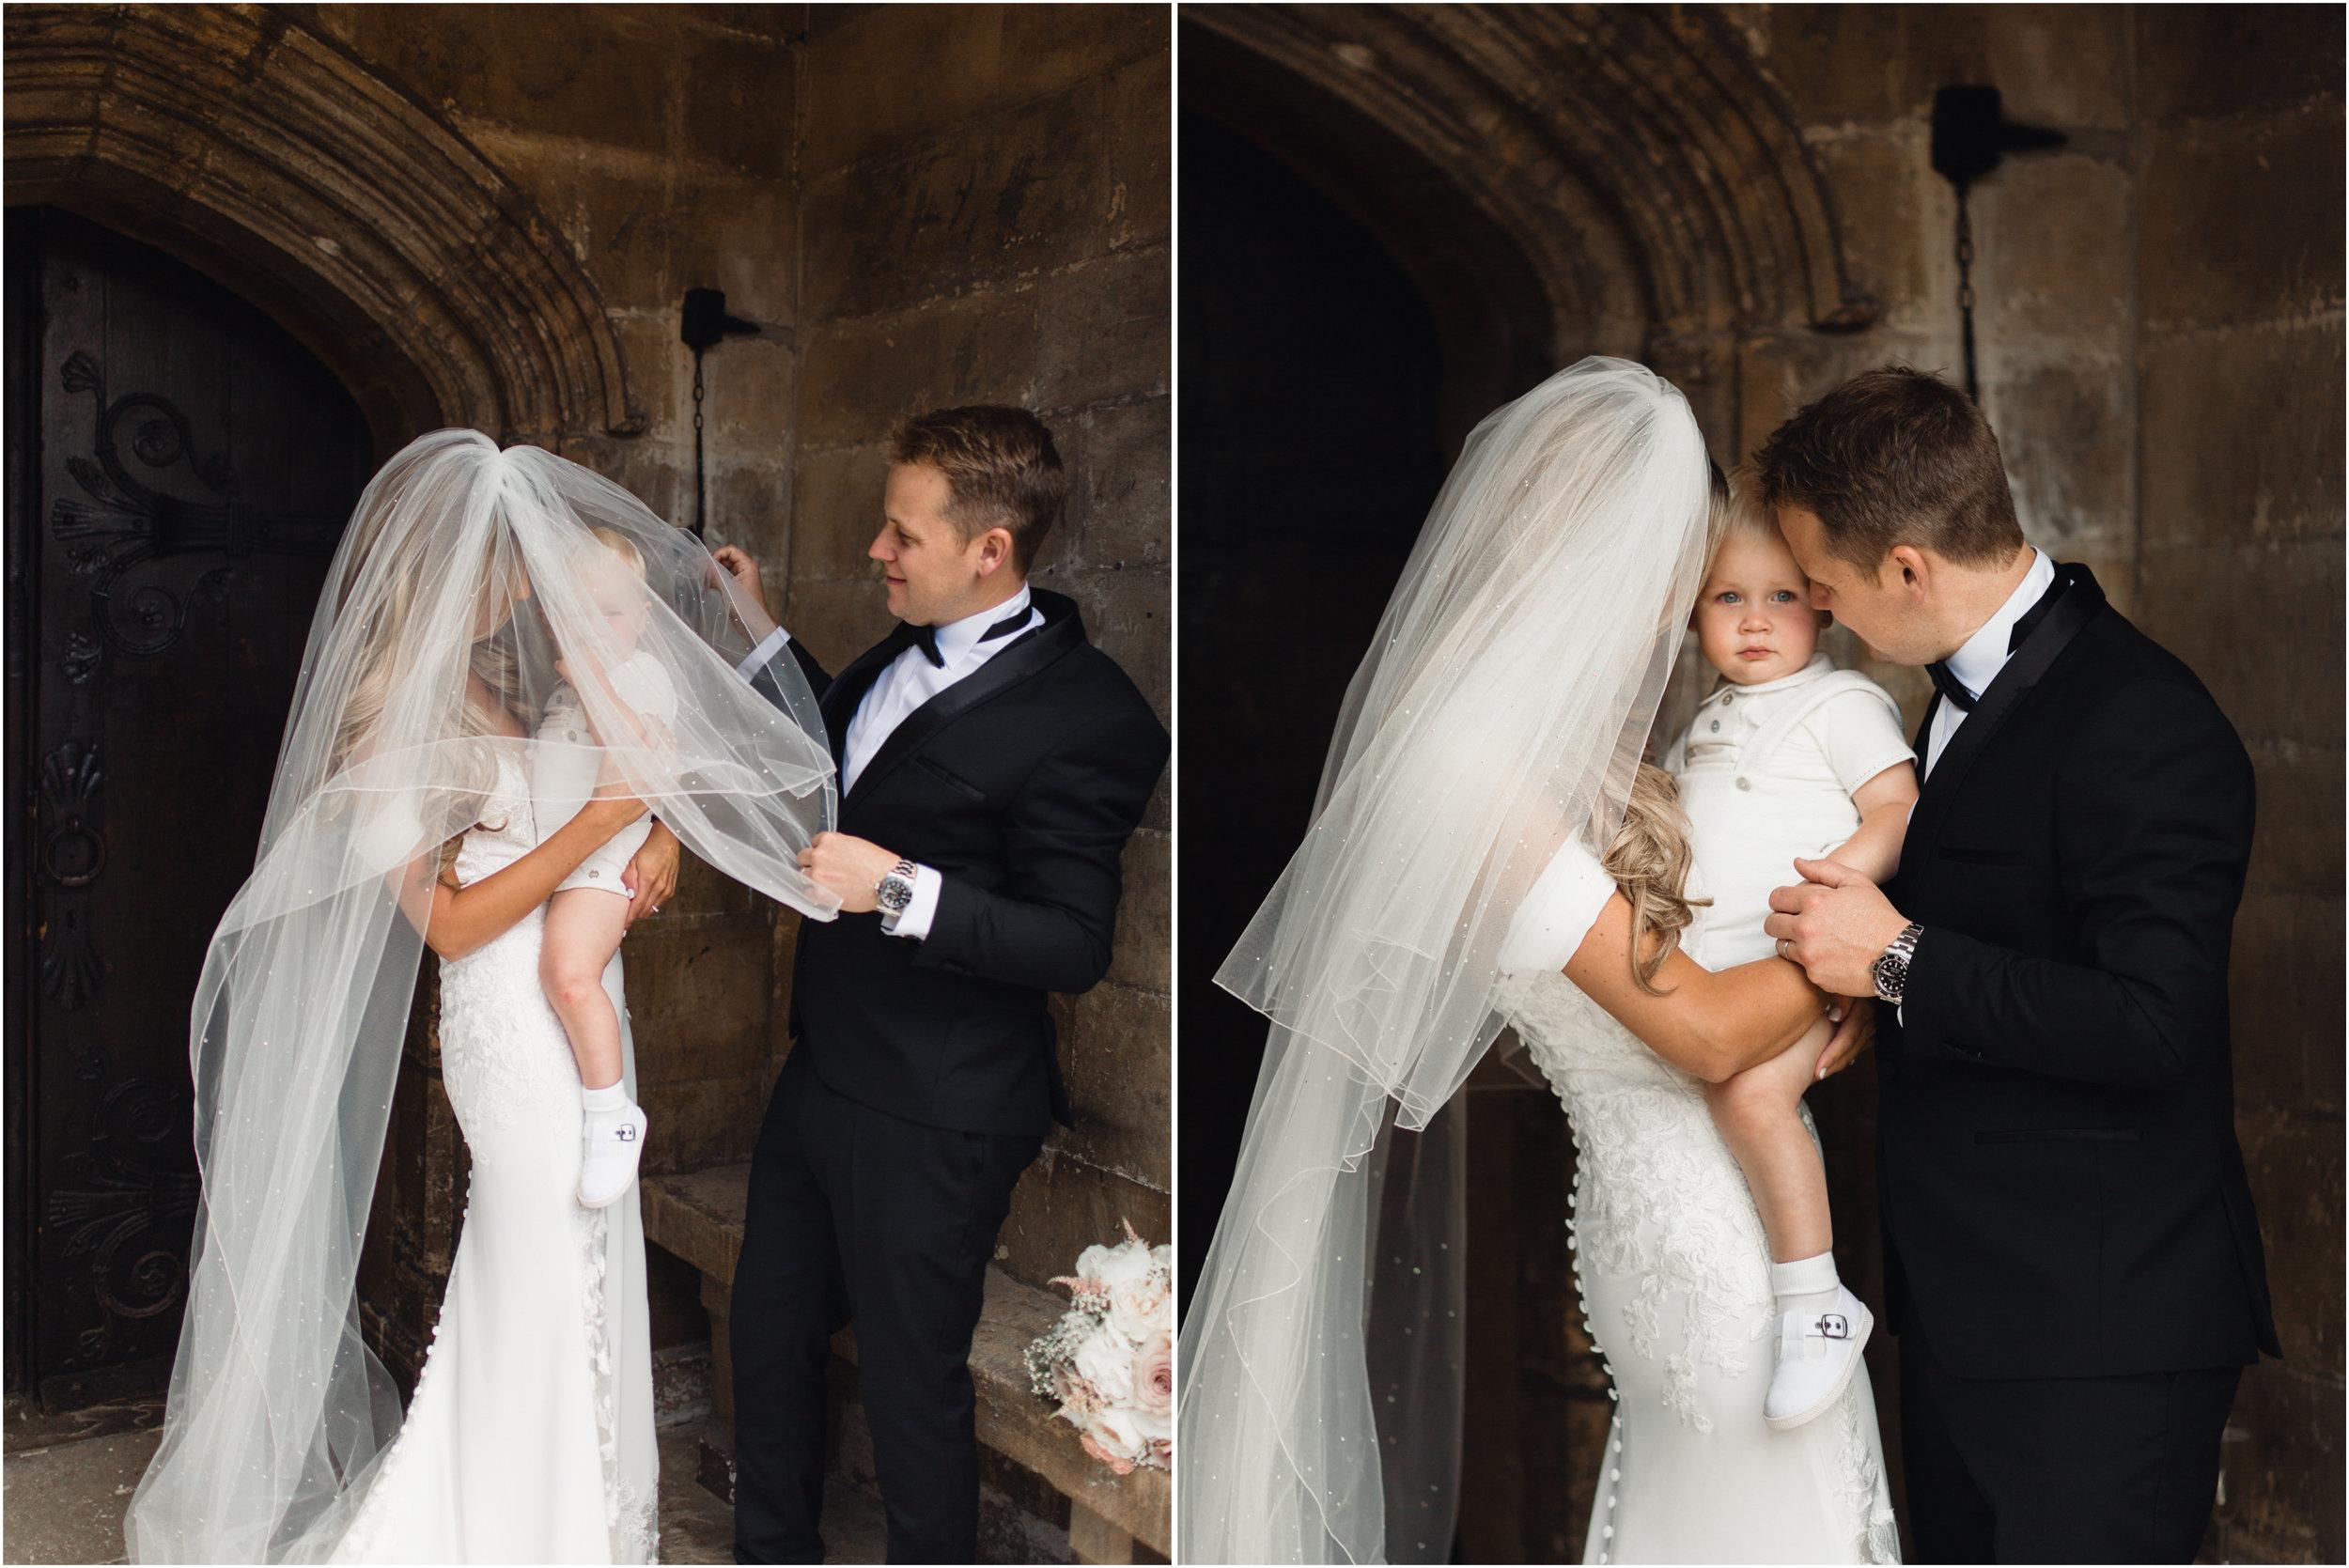 Rebecca Searle Wedding Photography Surrey London Luxury 51.jpg